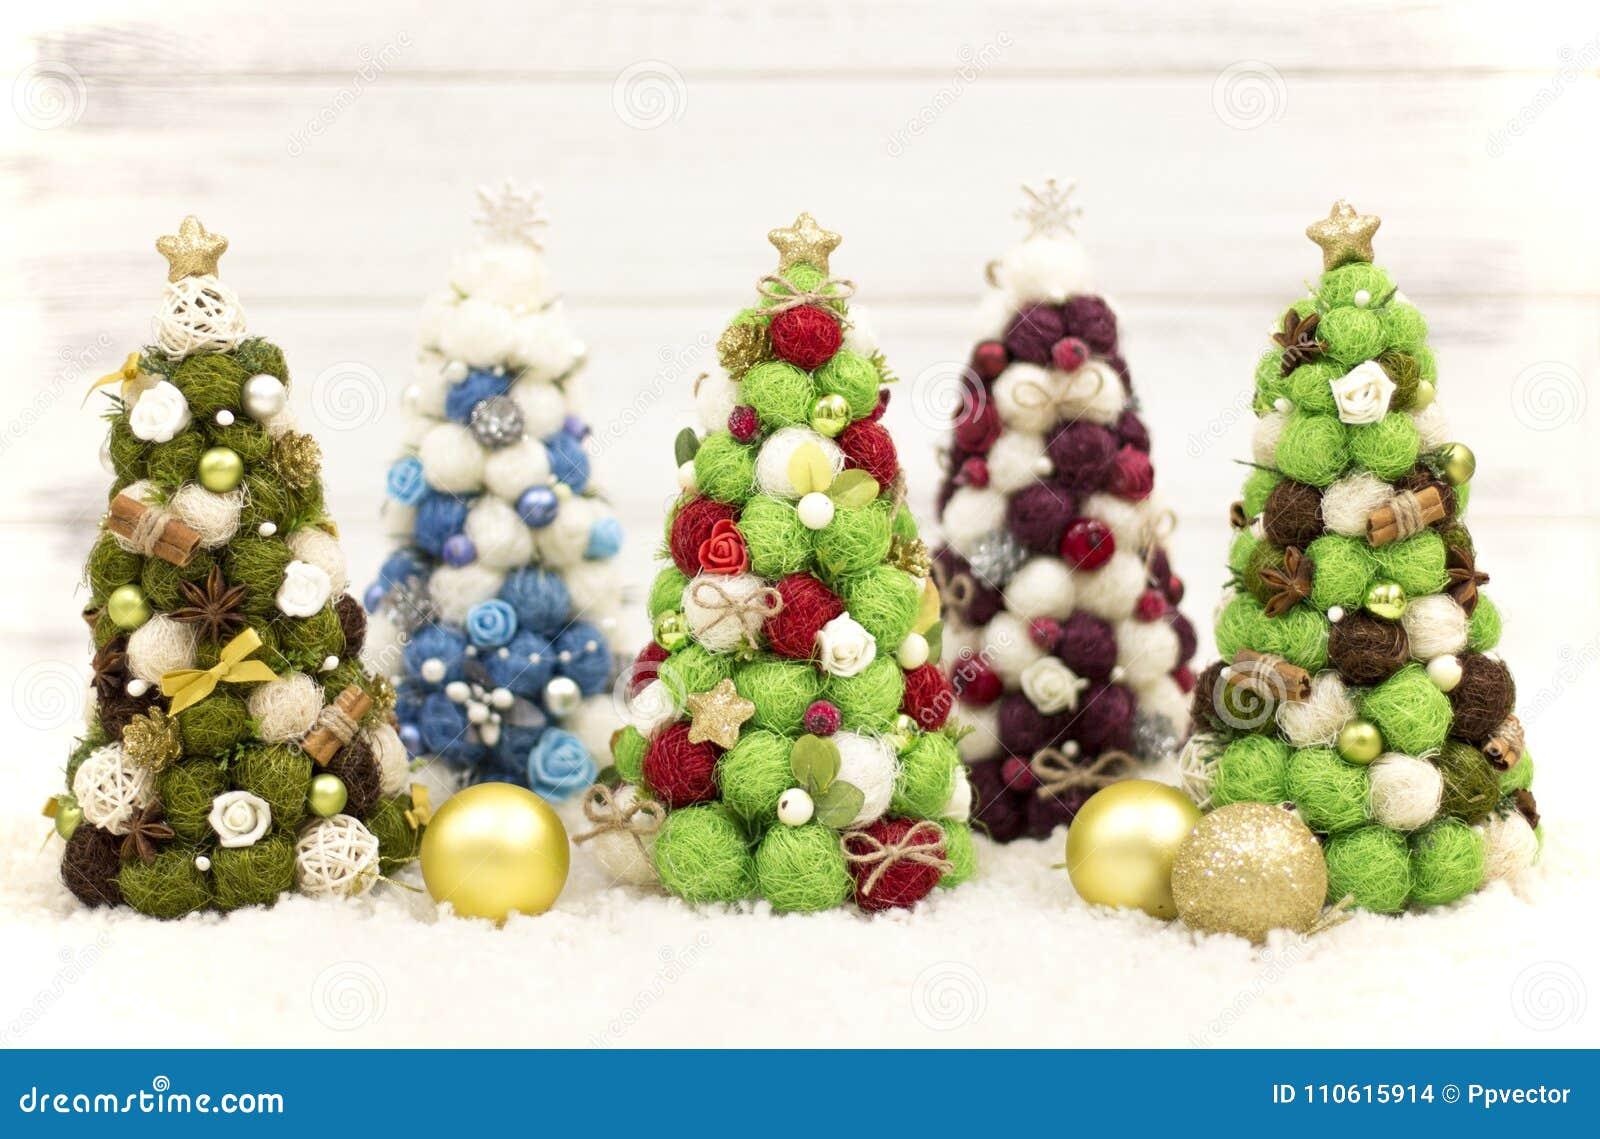 christmas tree decorative christmas tree new year and christmas decorations new year and christmas wallpapers christmas tree handmade